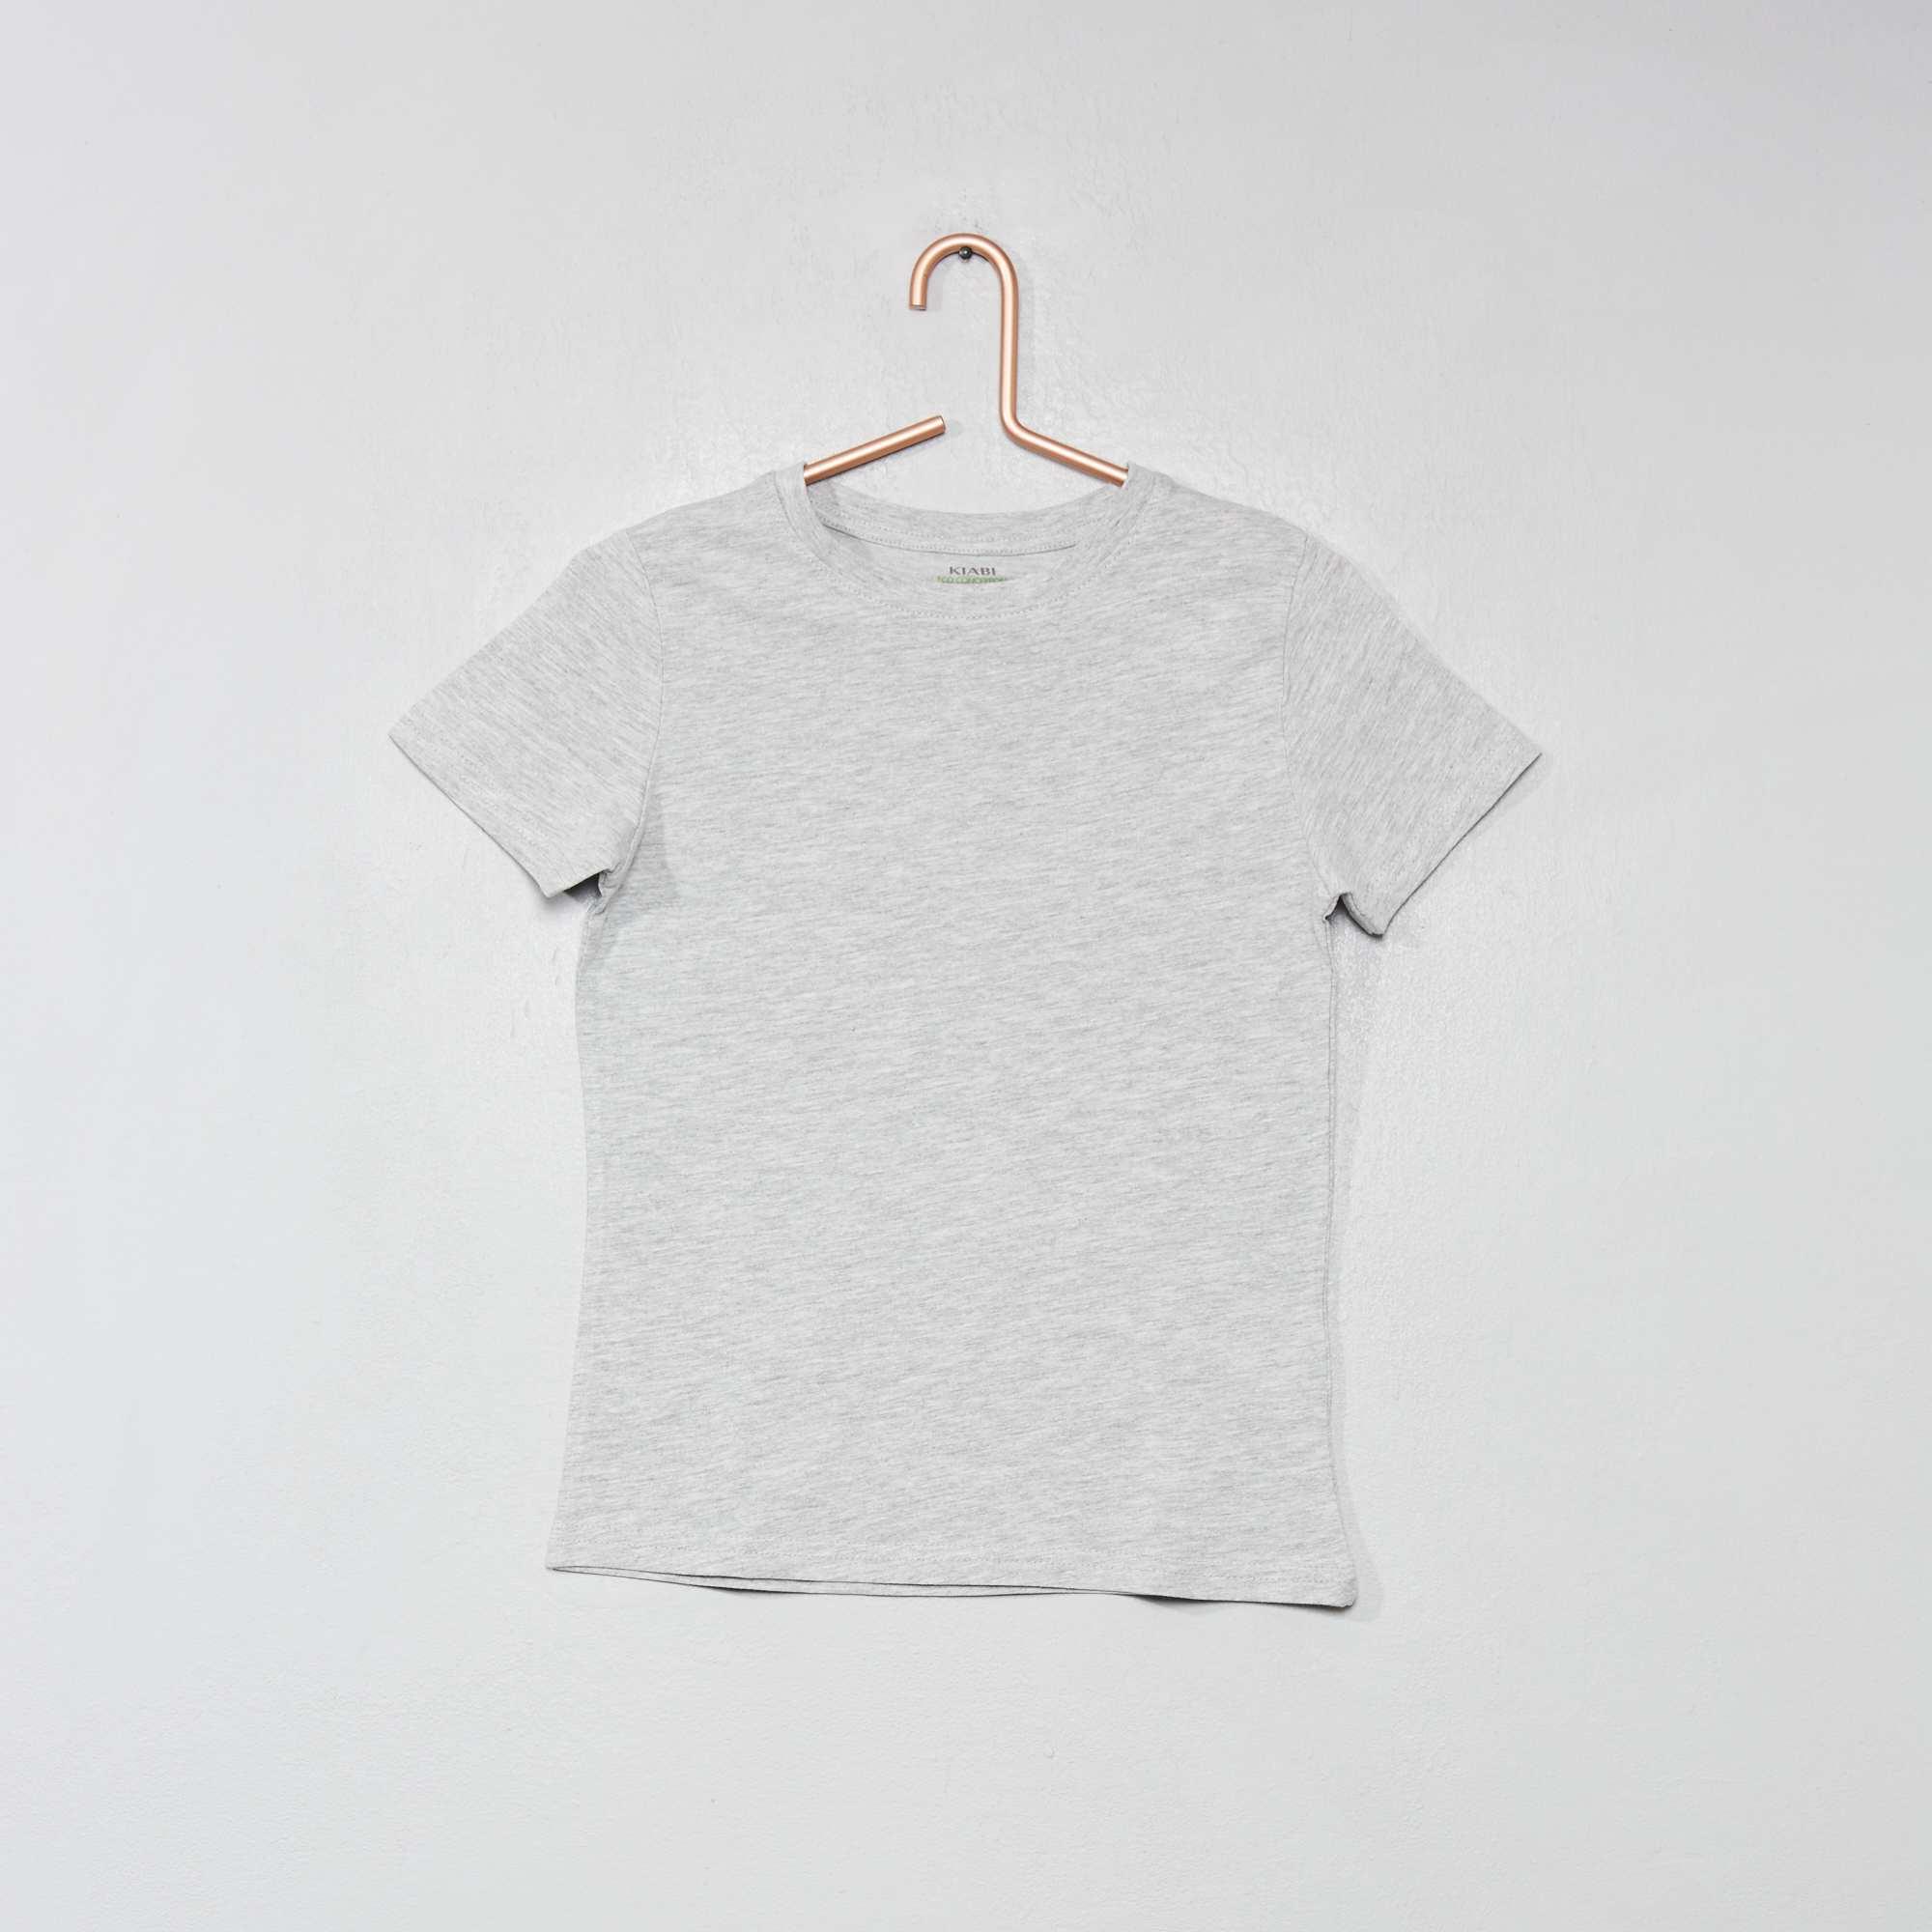 ee2cbcdd520 Camiseta de algodón puro bio Chico - GRIS - Kiabi - 2